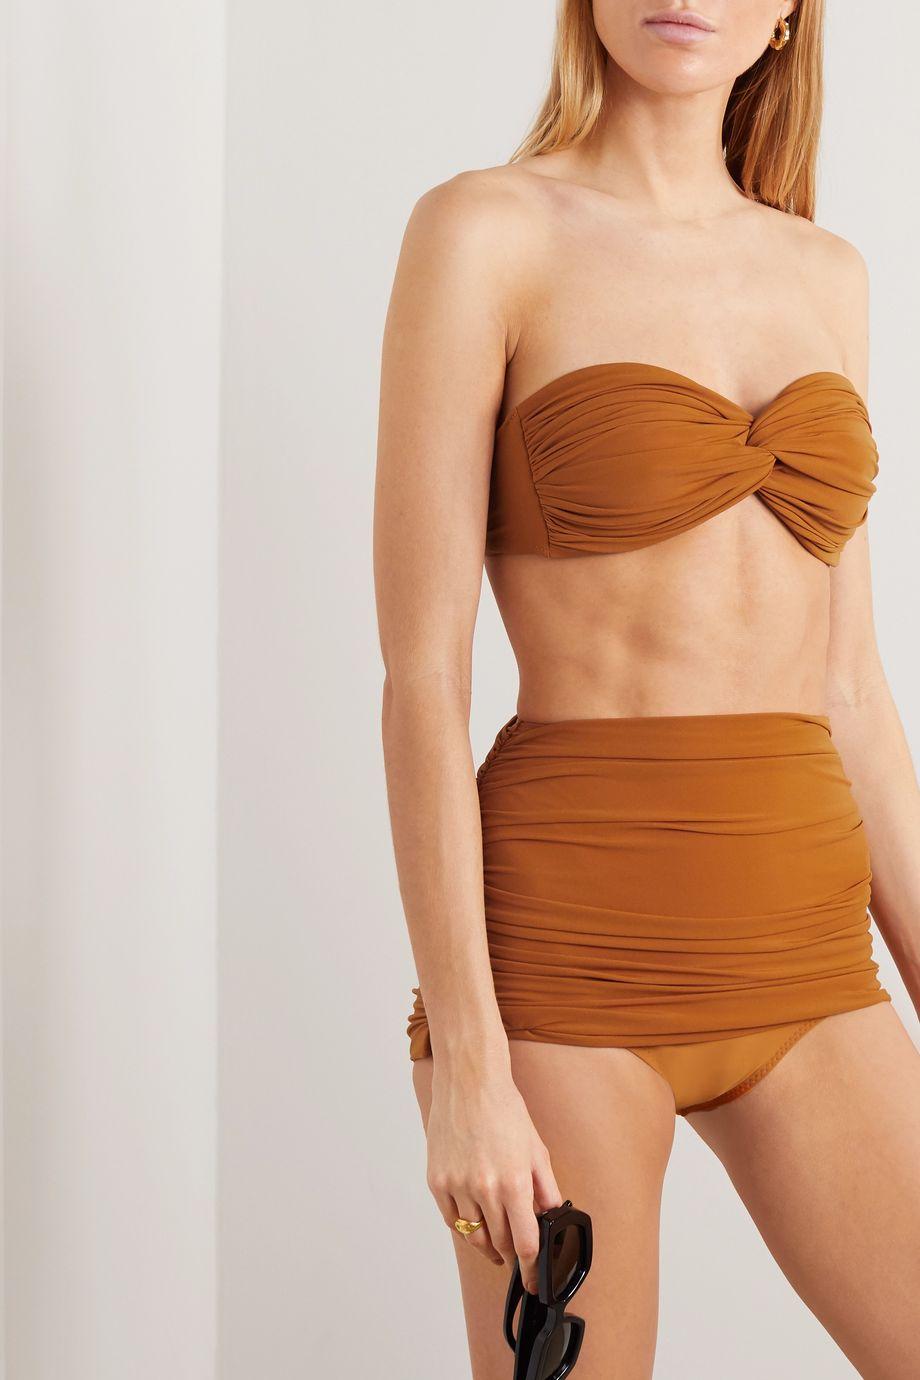 Norma Kamali Haut de bikini bandeau froncé Johnny D